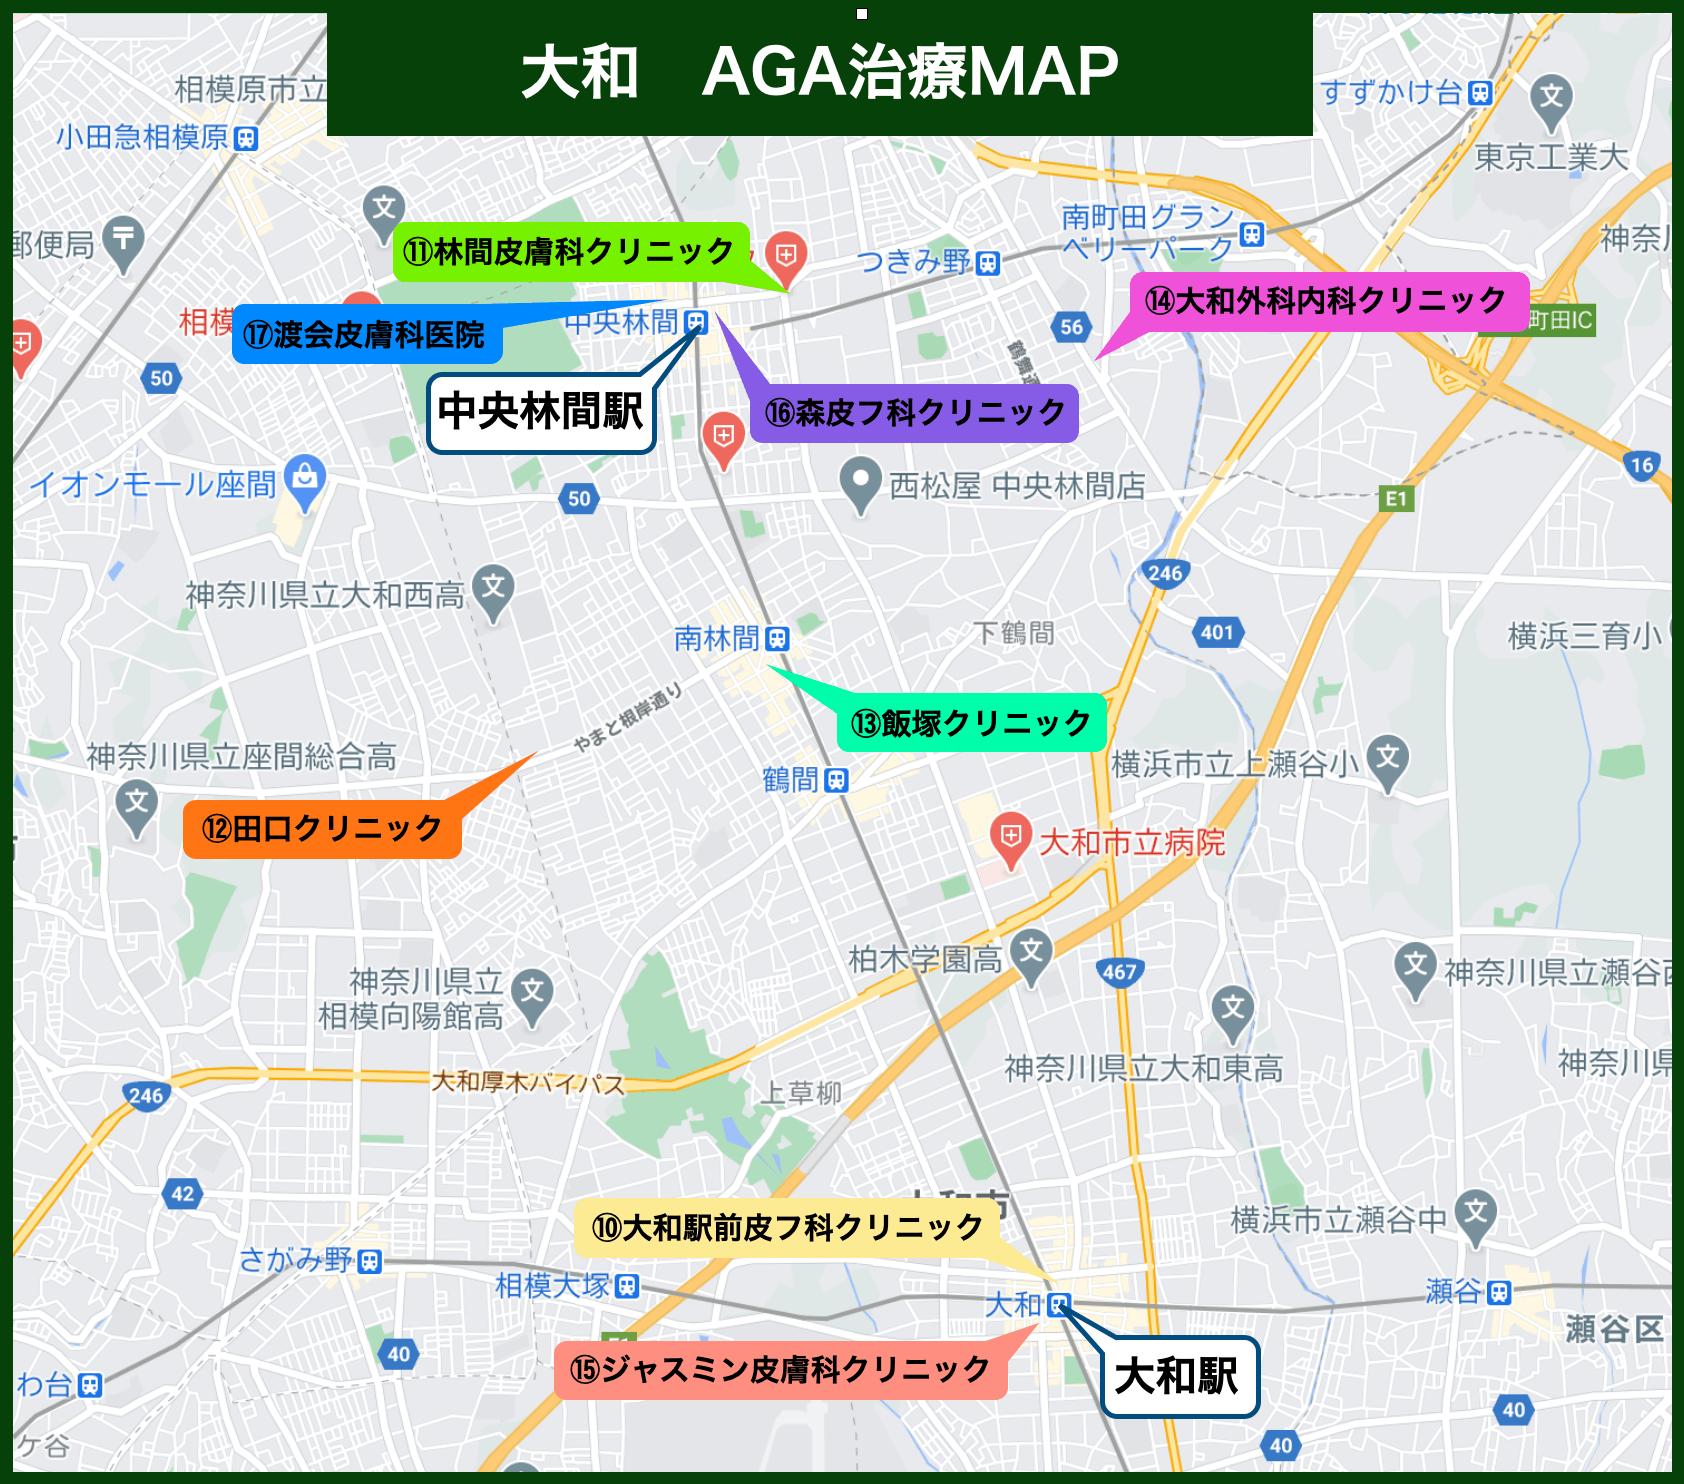 大和 AGA治療MAP